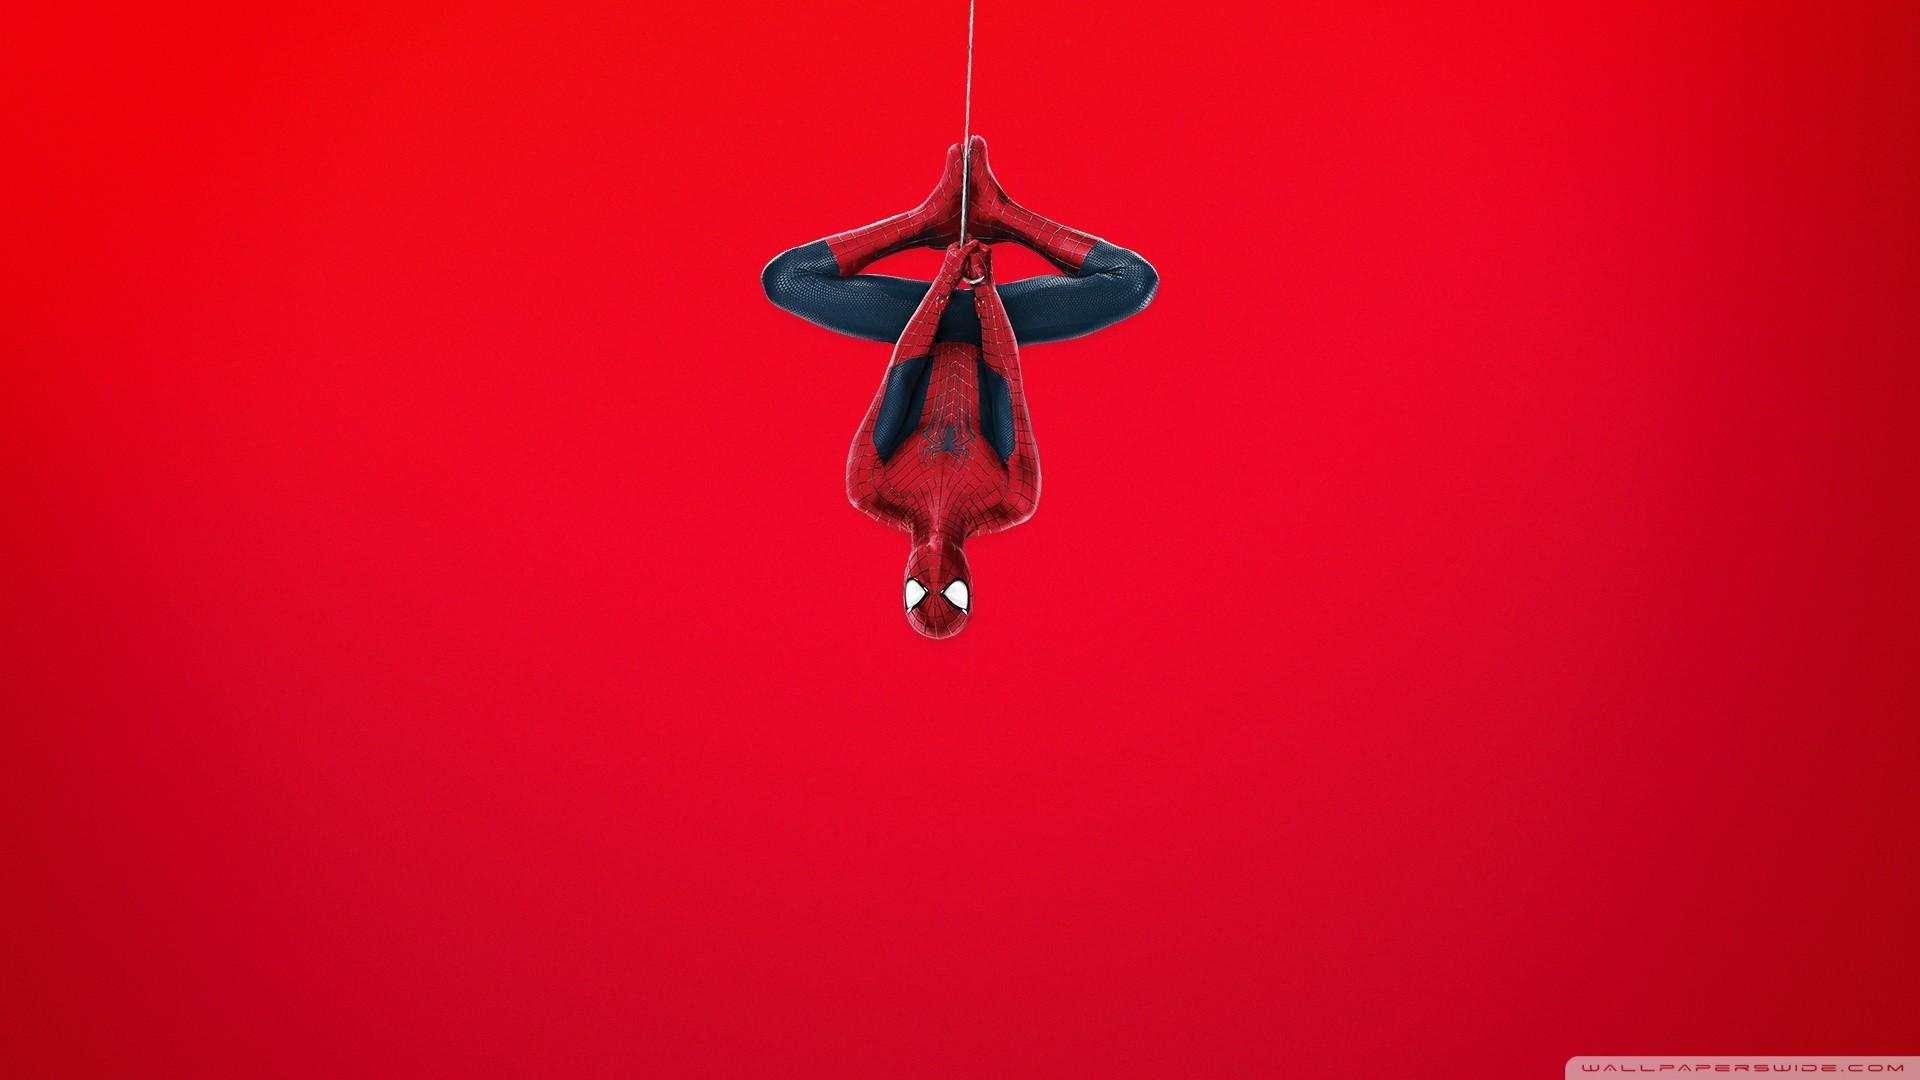 HD desktop wallpaper Spider man 1920 × 1080 . https://nirhara.com/ | Spider  man Wallpaper- HD Desktop Background | Pinterest | Spiderman, Amazing  spider and …